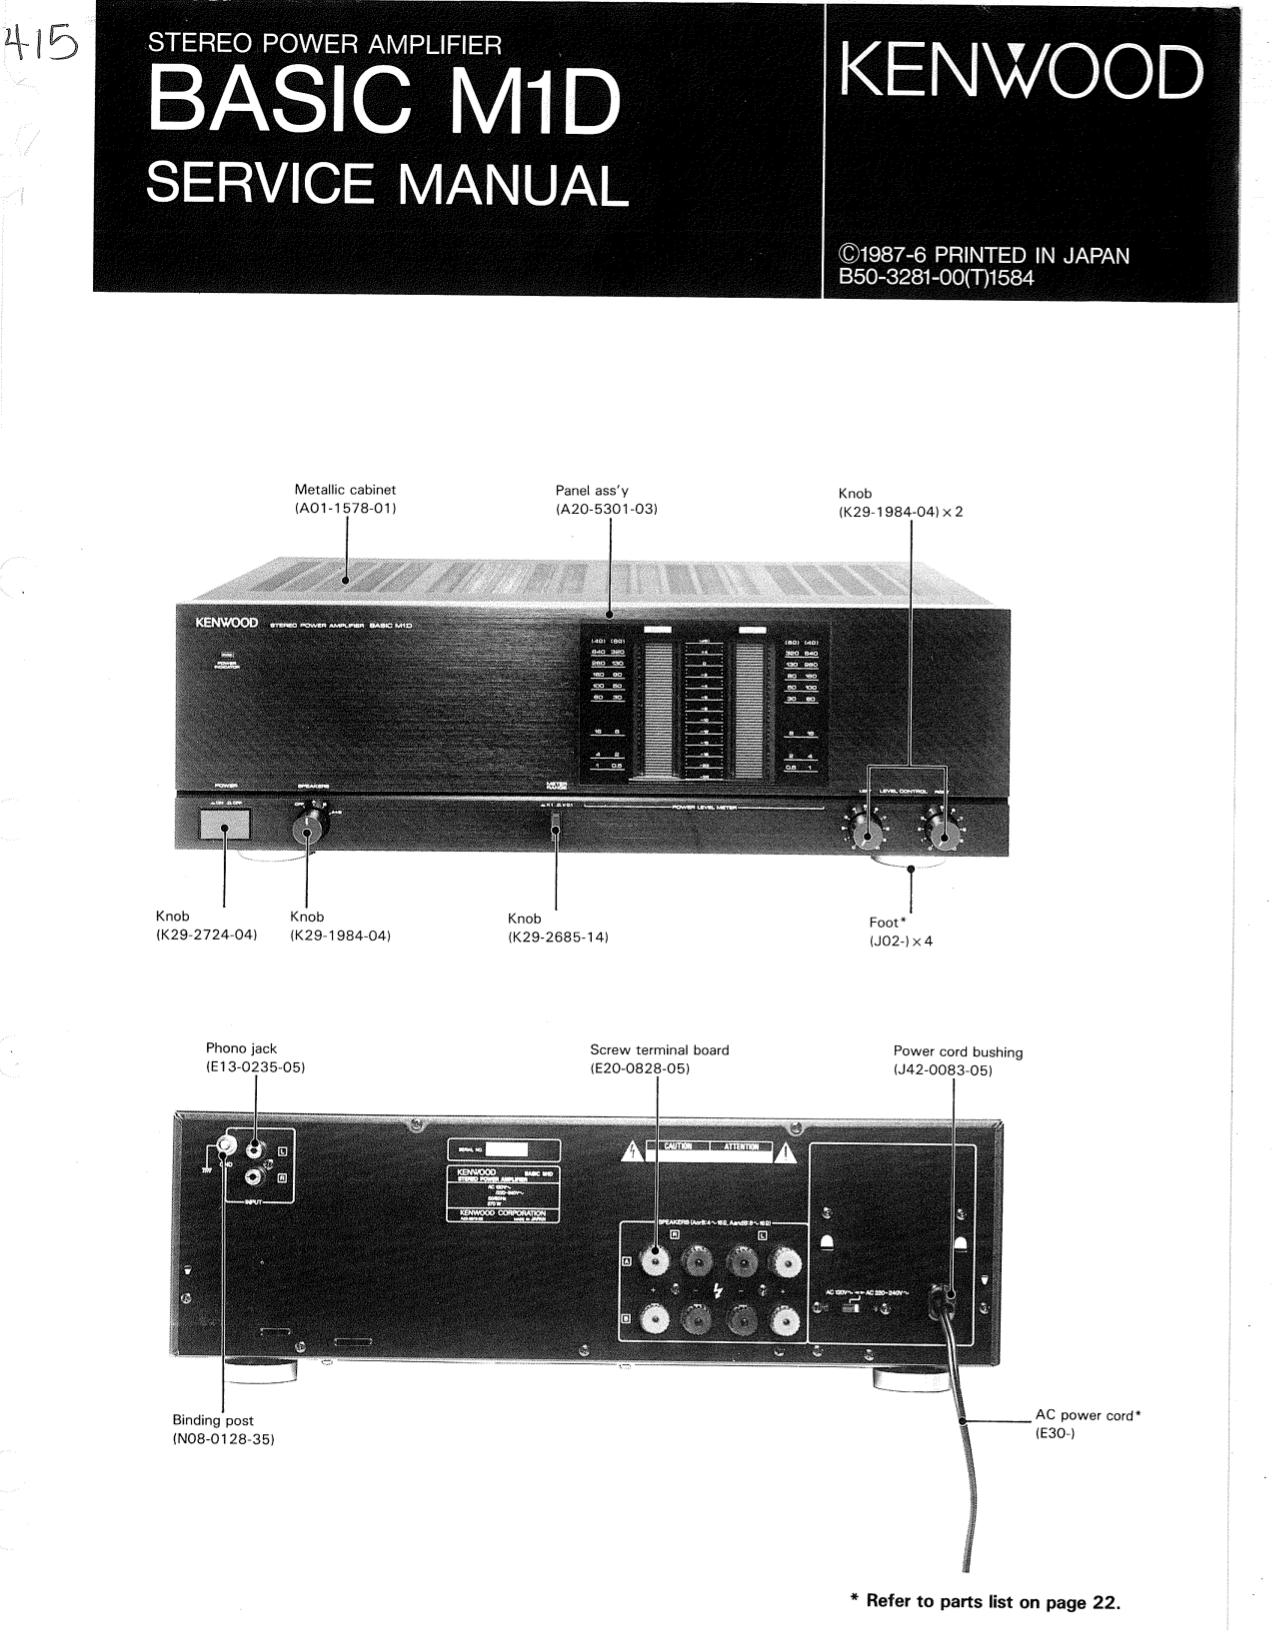 download free pdf for kenwood basic m1d amp manual rh umlib com kenwood amp manual for km-106 kenwood a85 amplifier manual